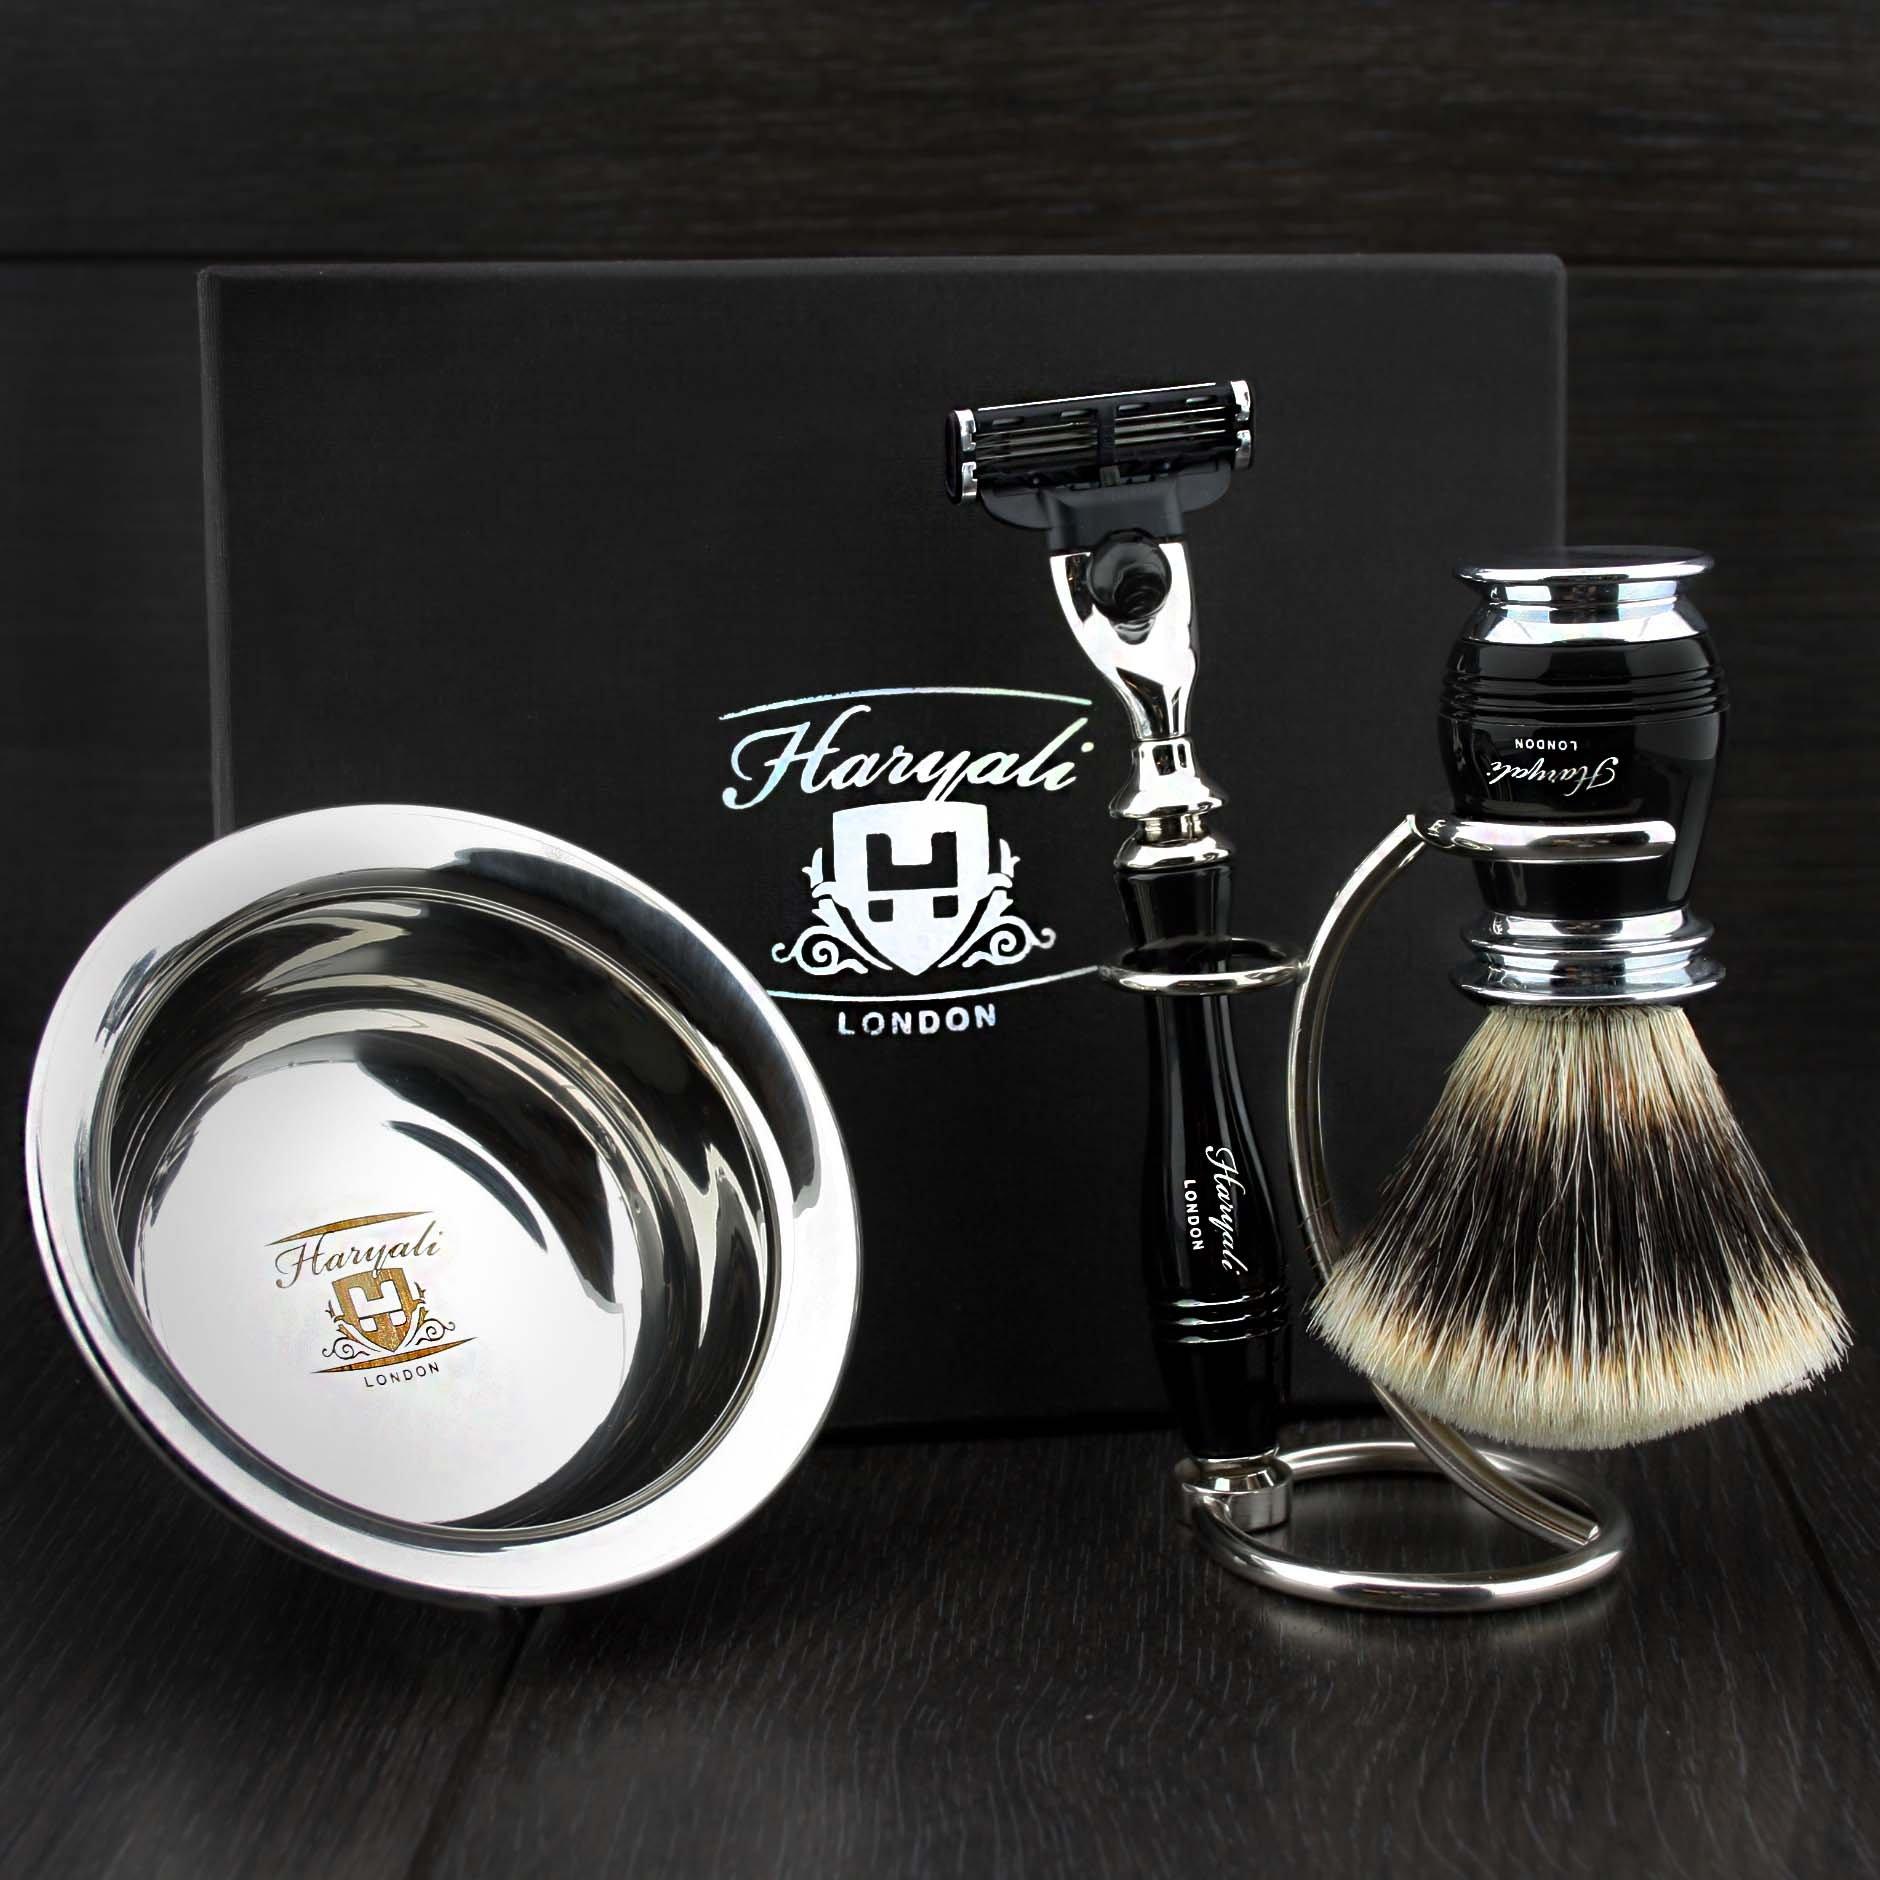 Haryali London 4 Pc Mens Shaving Kit 3 Edge Razor With Silver Tip Badger Hair Shaving Brush, Stand and Stainless Steel Bowl Perfect Set For Men by Haryali London